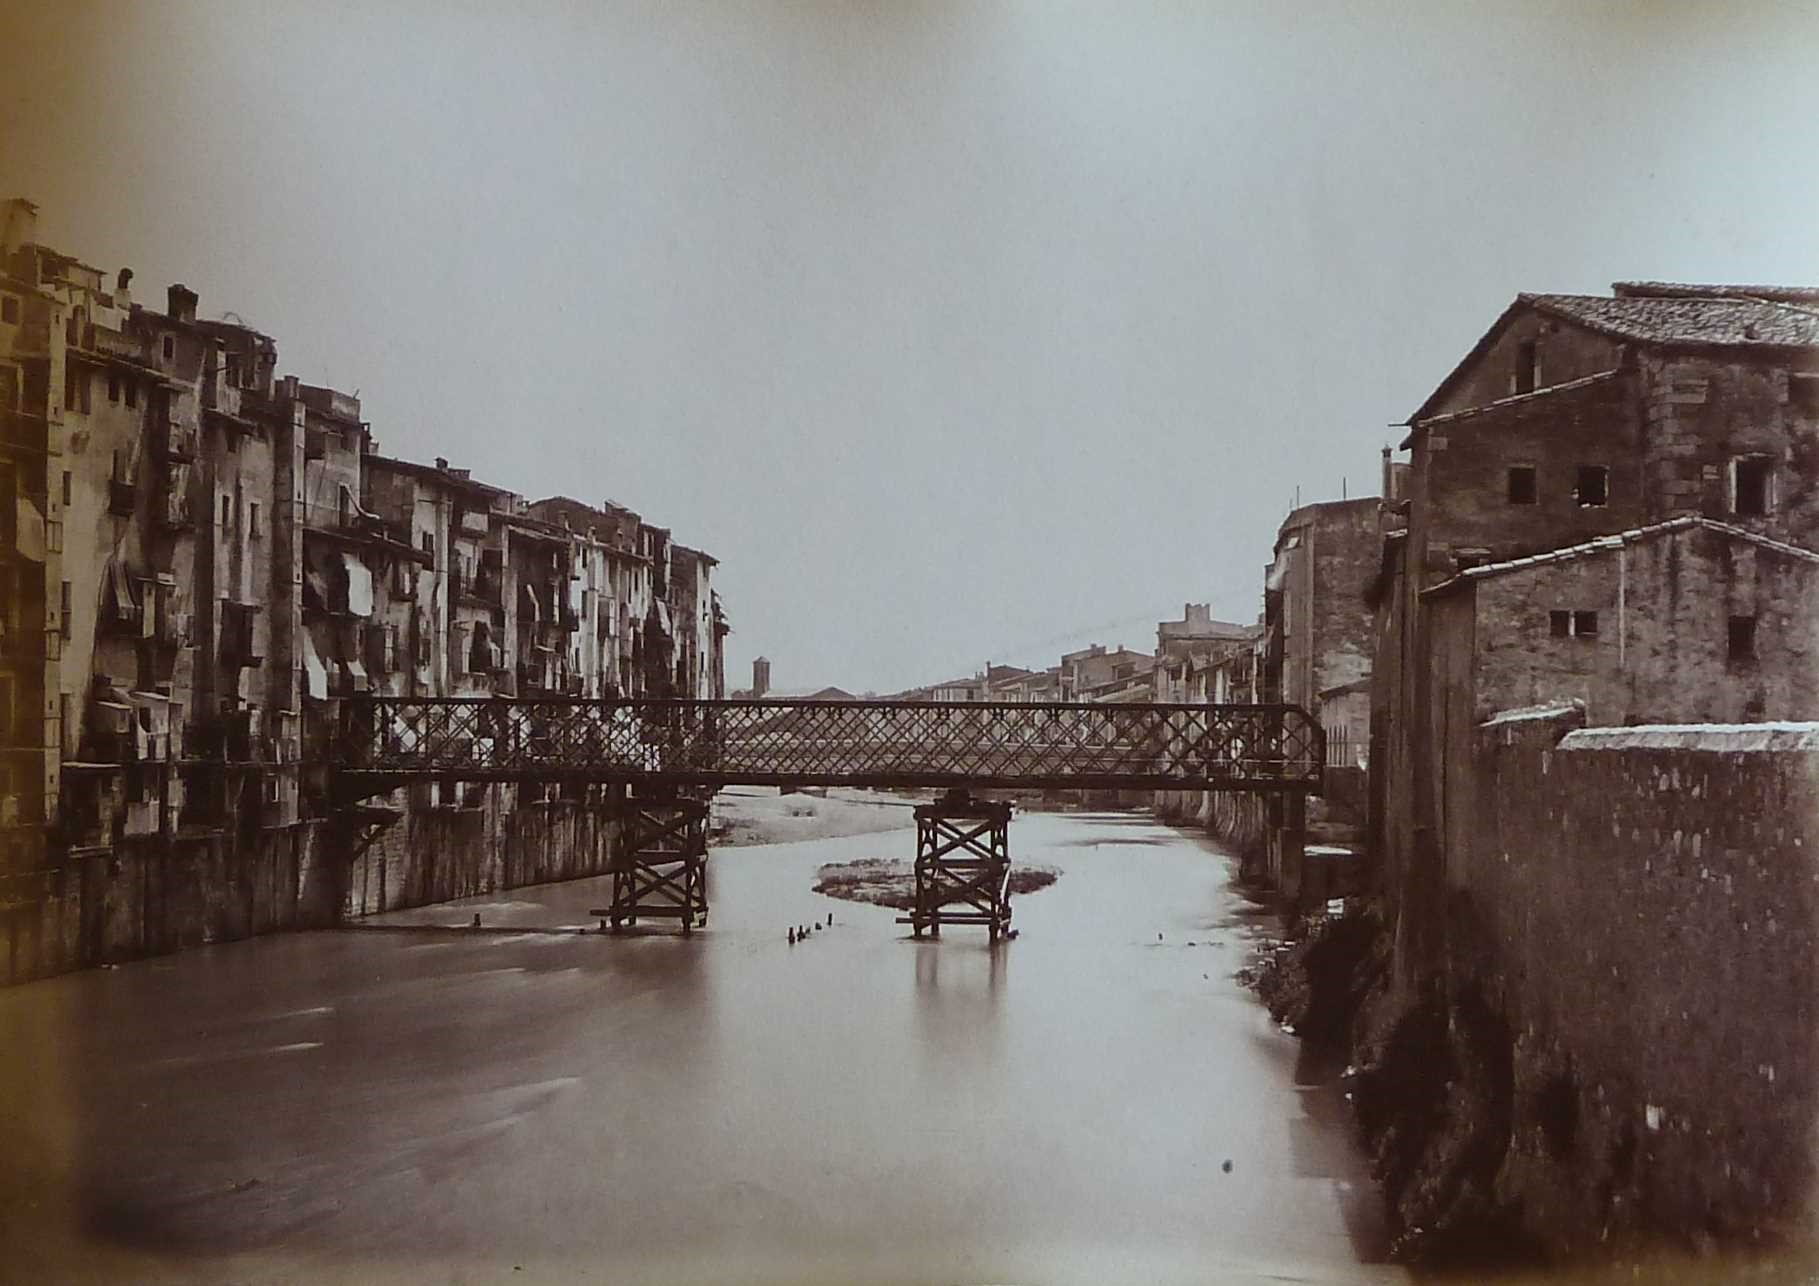 Pont de ferro inaugurat el 1877